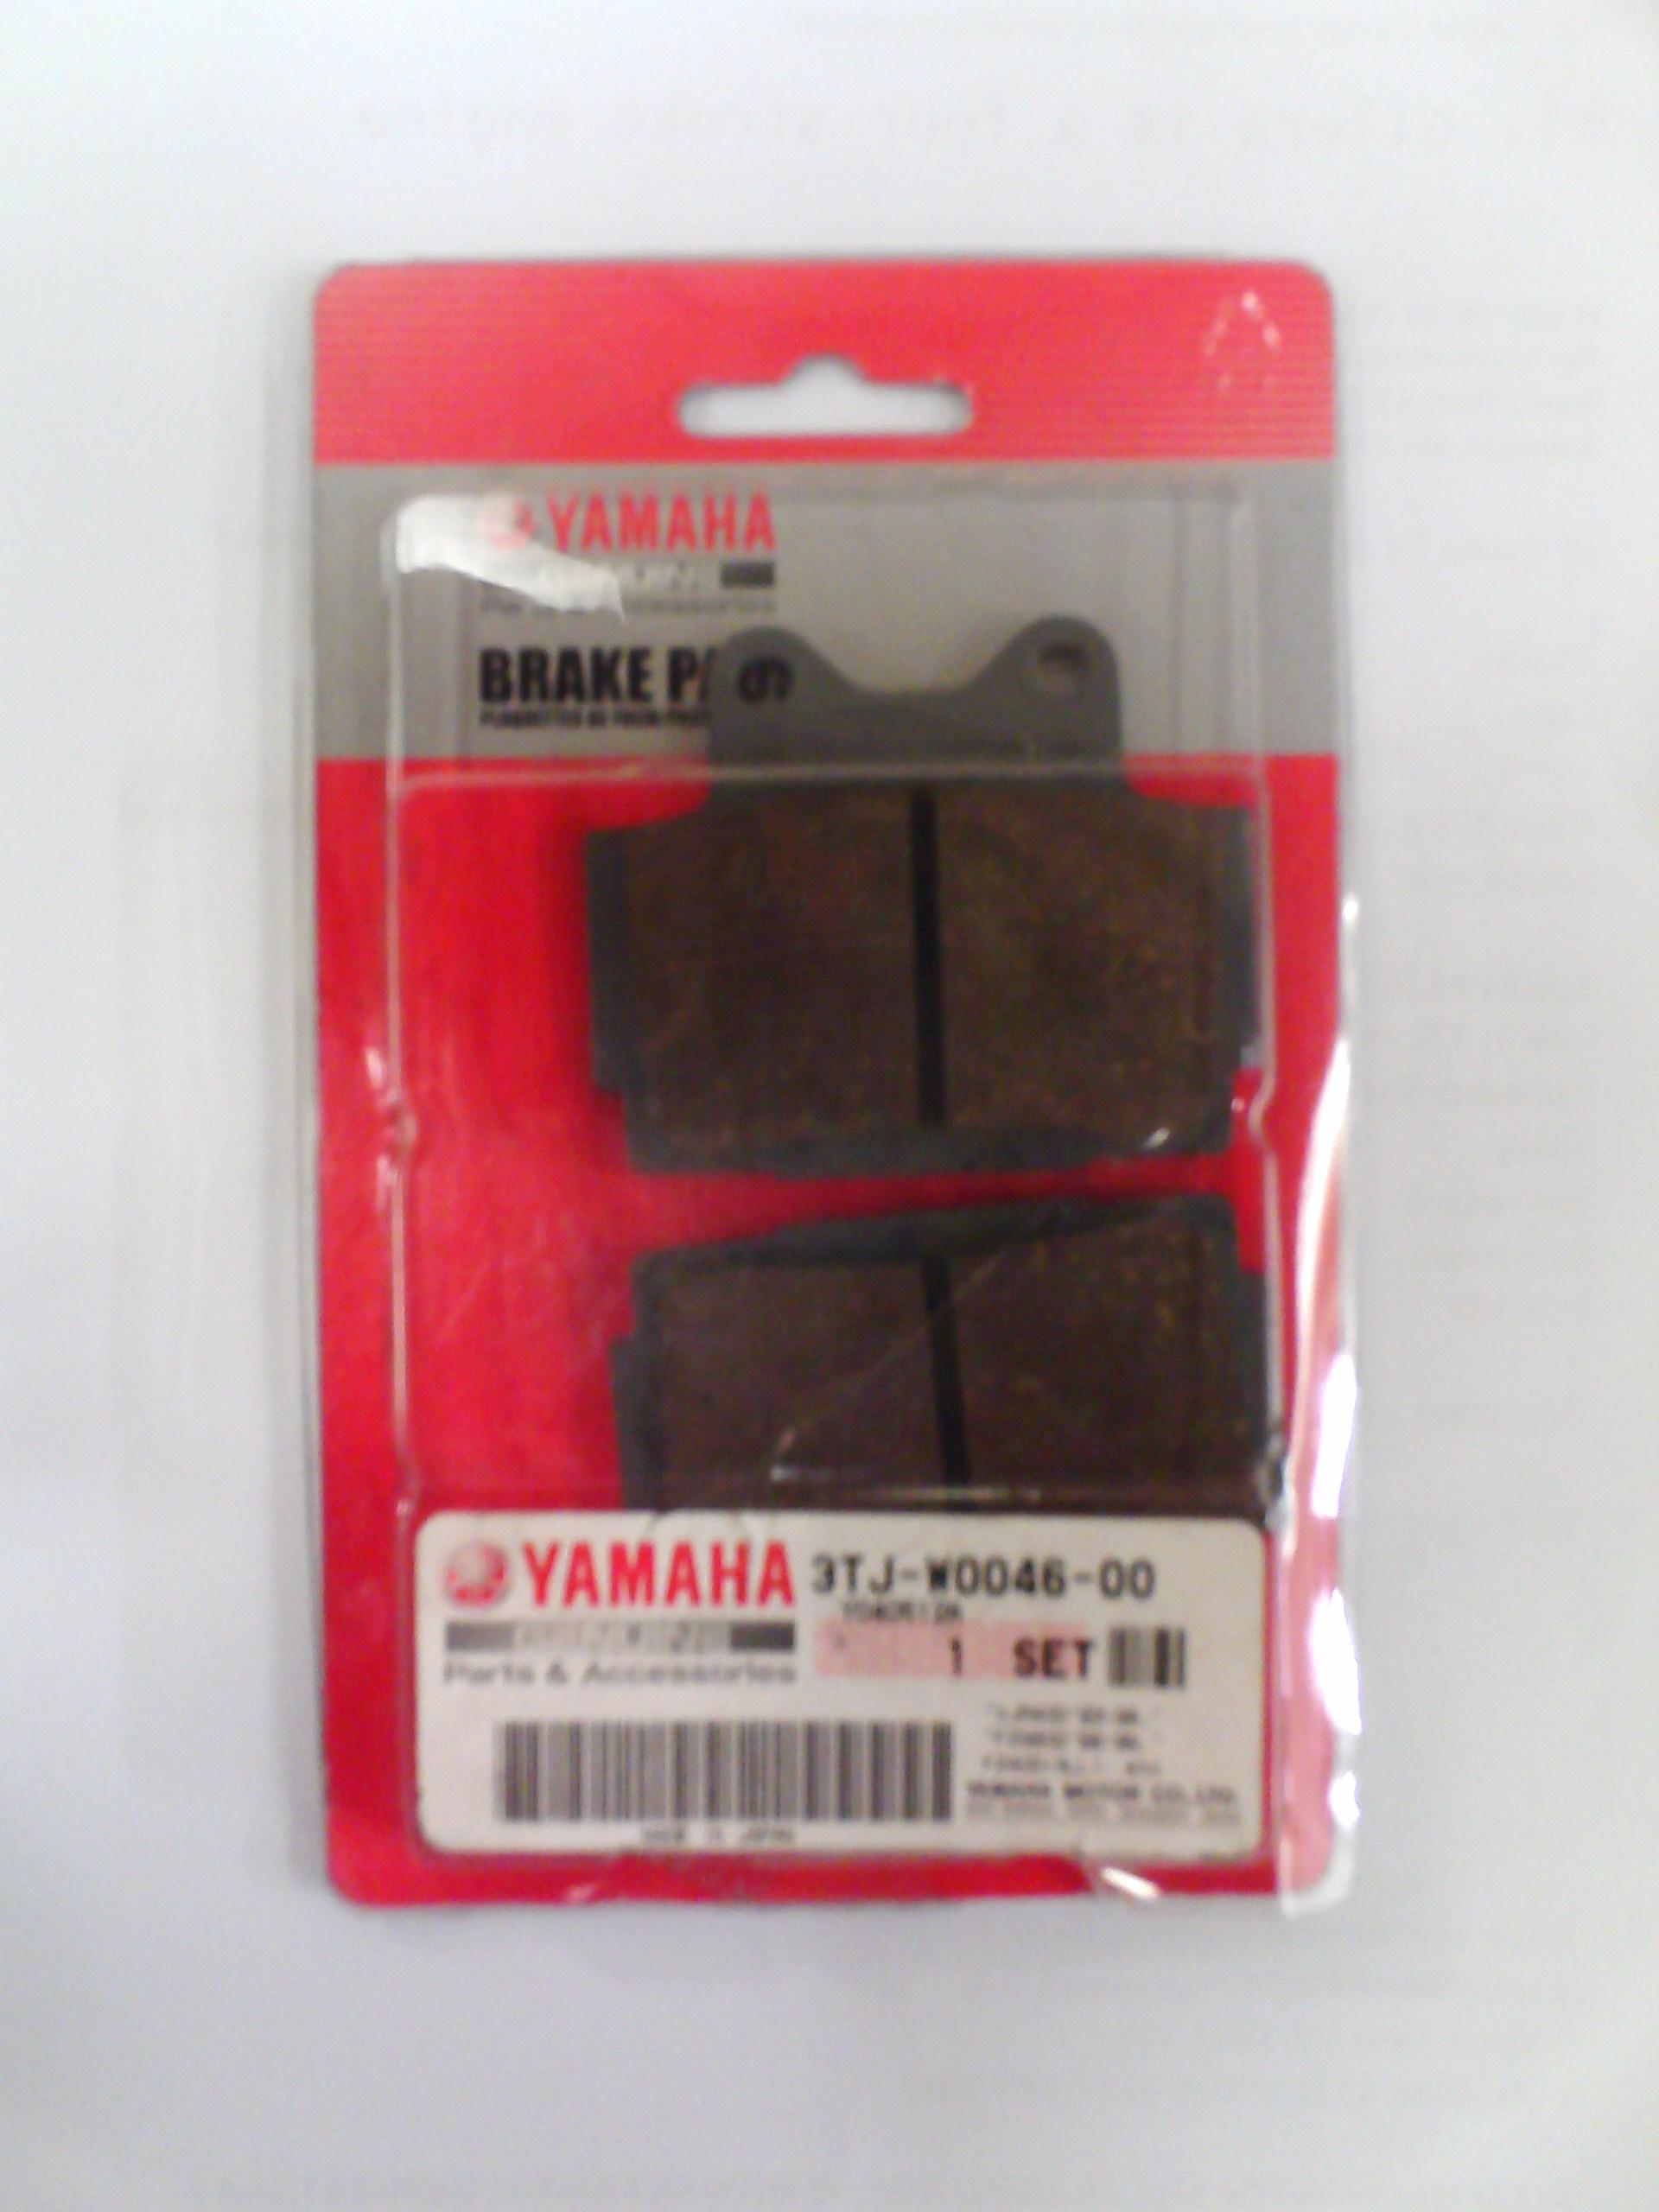 http://www.southernbikespares.co.uk/images/Ebay2/S/yamaha/OEM%20Brake%20Pads%20(3TJ-W0046-00).JPG